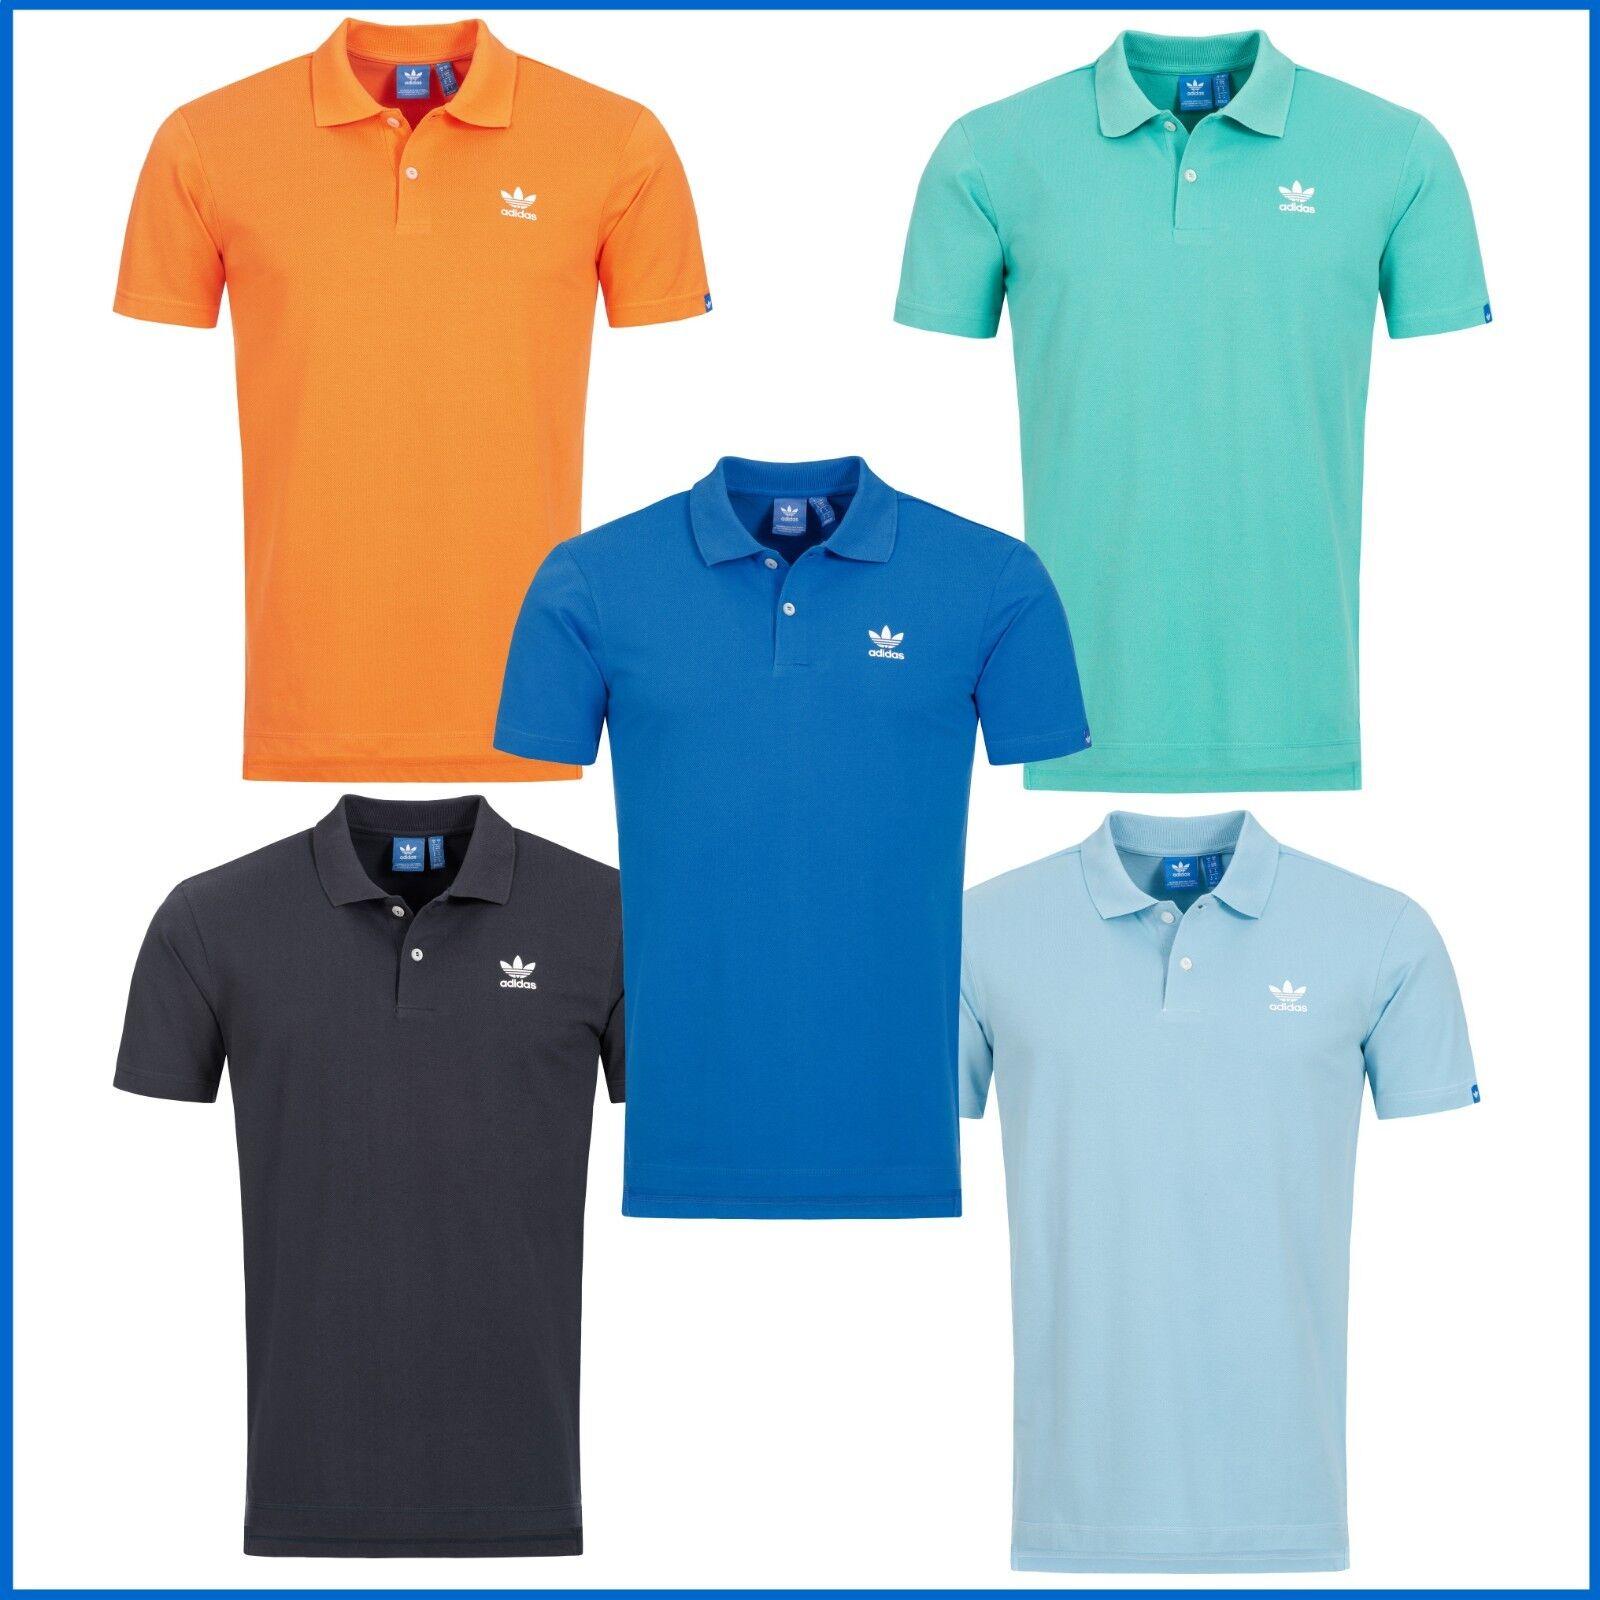 739fc66ad68fe0 Adidas Poloshirt Herren T-Shirt Polo Hemd Trefoil Tee Shirts   S - X L